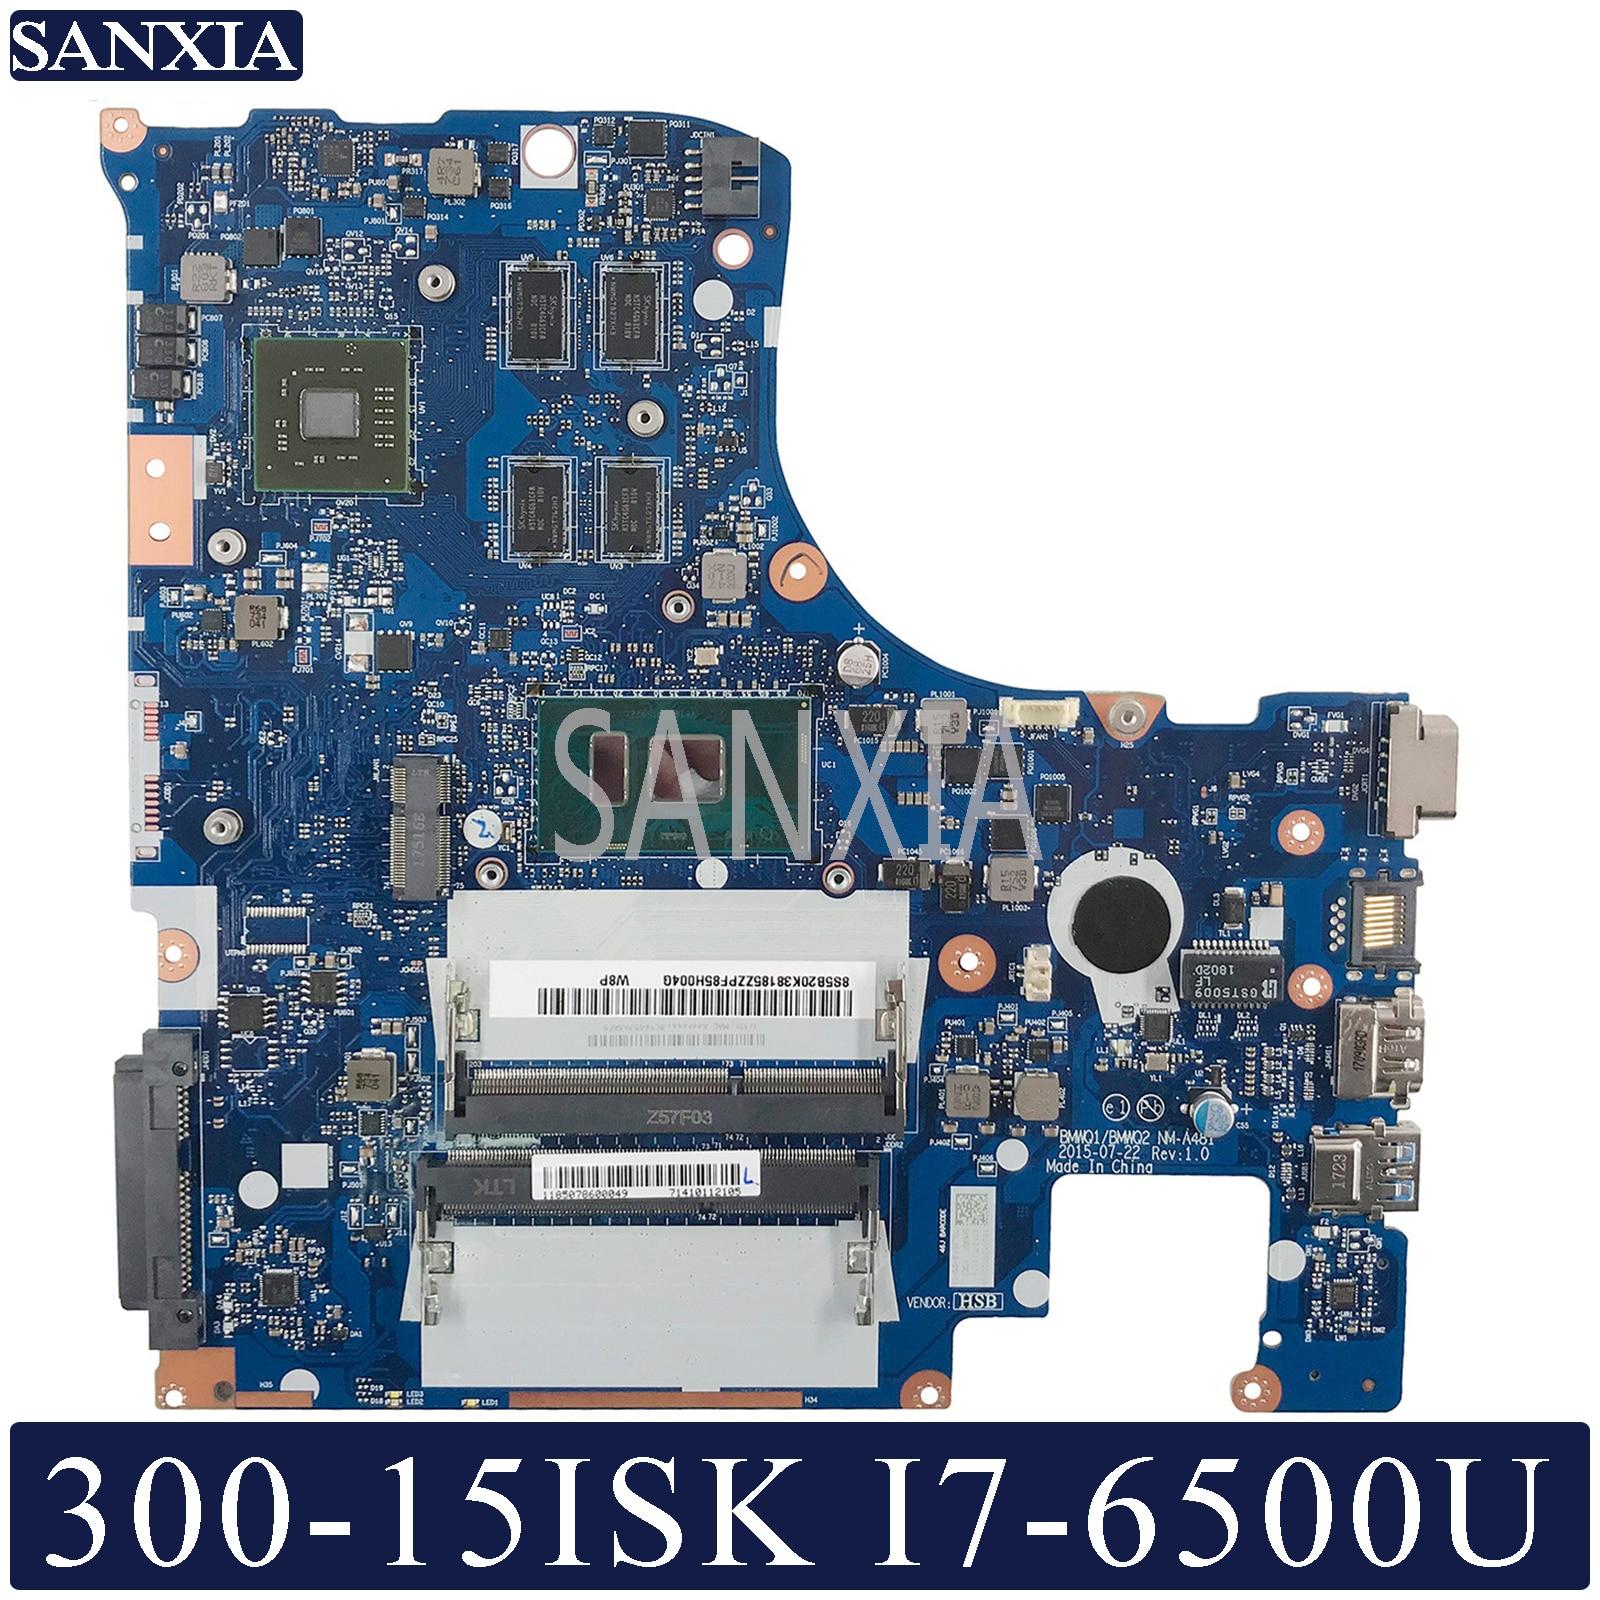 KEFU NM-A481 Laptop motherboard para Lenovo Ideapad I7-6500U 300-15ISK mainboard original com placa de vídeo